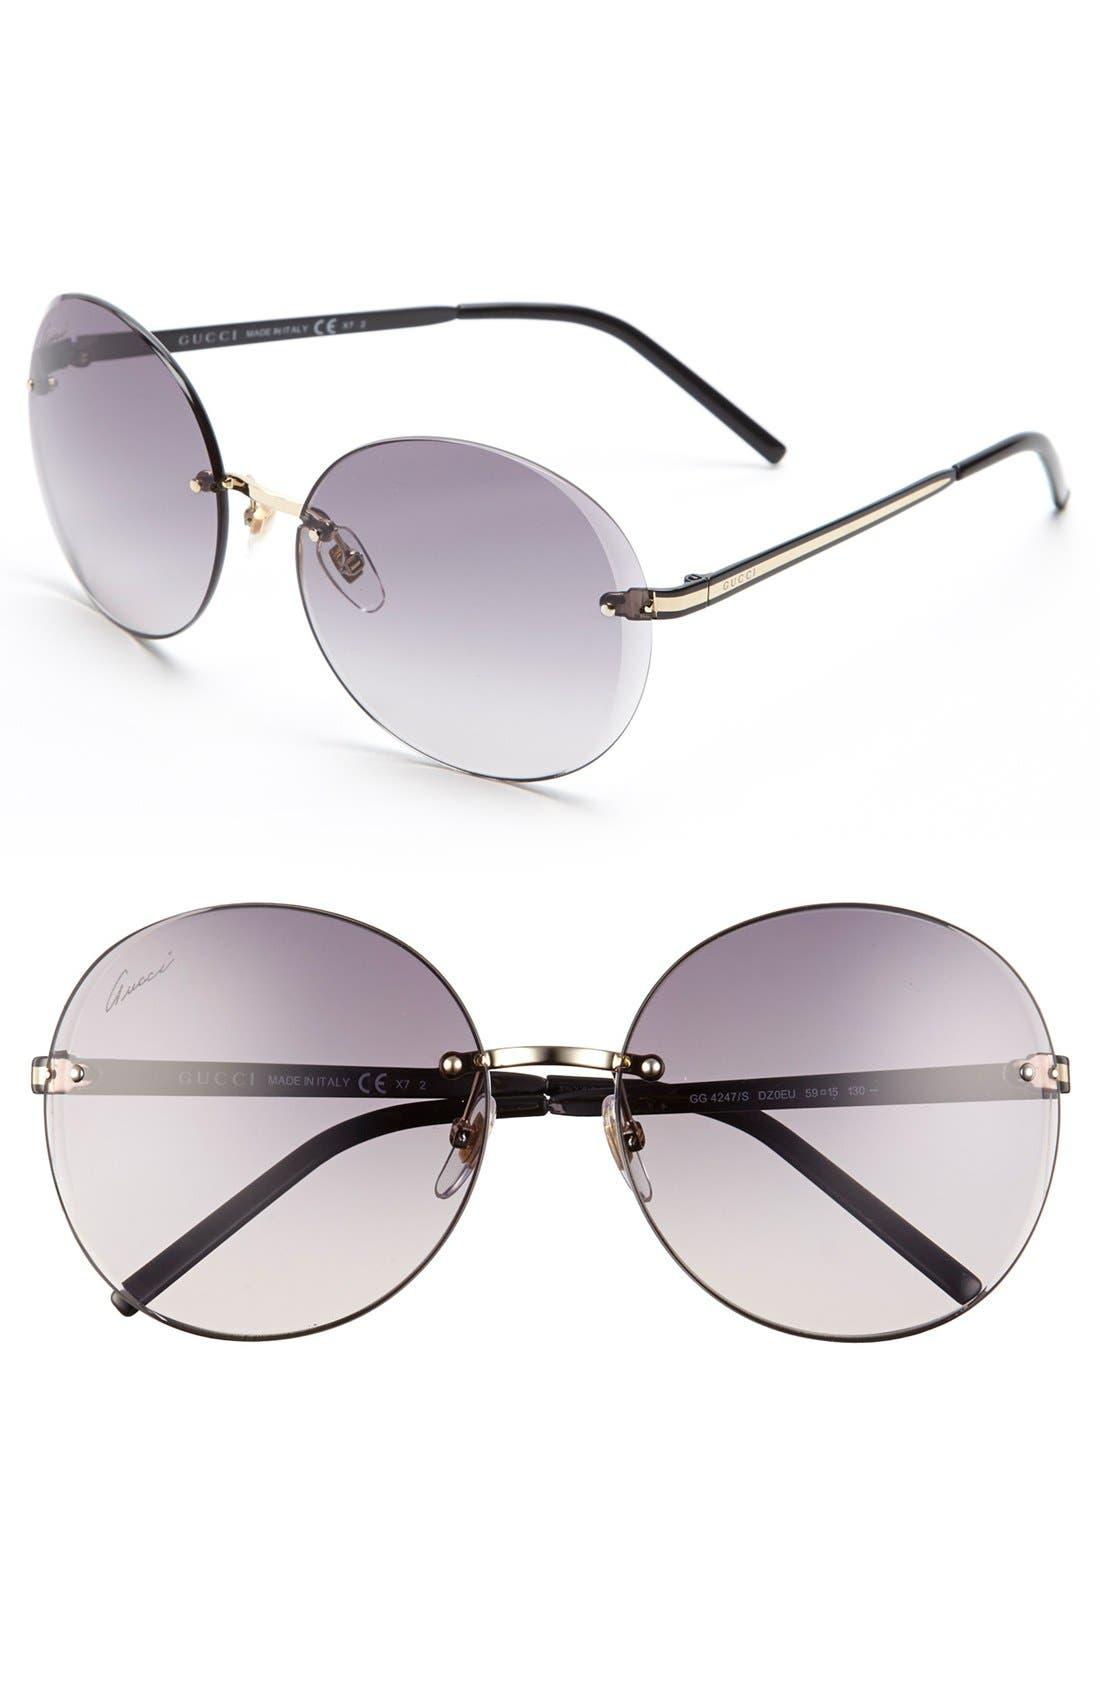 Alternate Image 1 Selected - Gucci 'Flora' 59mm Rimless Sunglasses